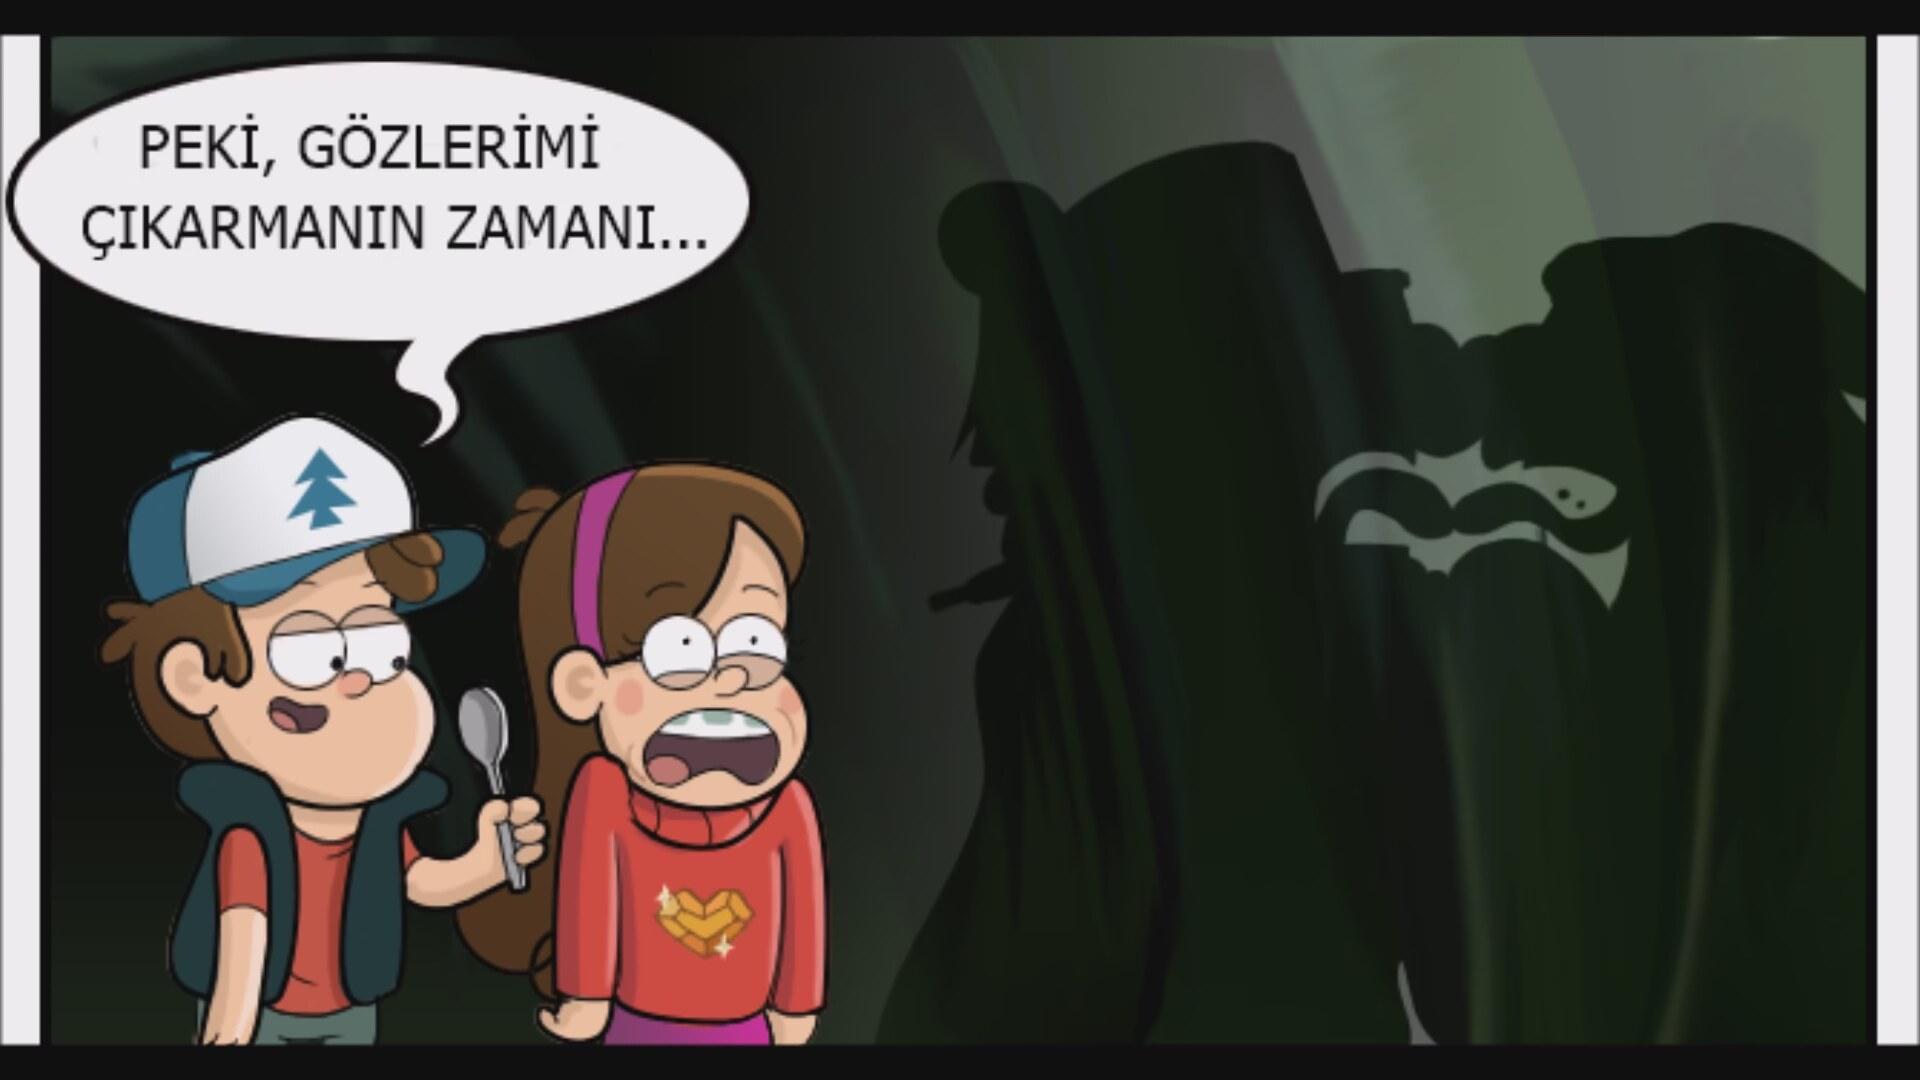 Esrarengiz Kasaba Iyyy çizgi Roman Izlesenecom